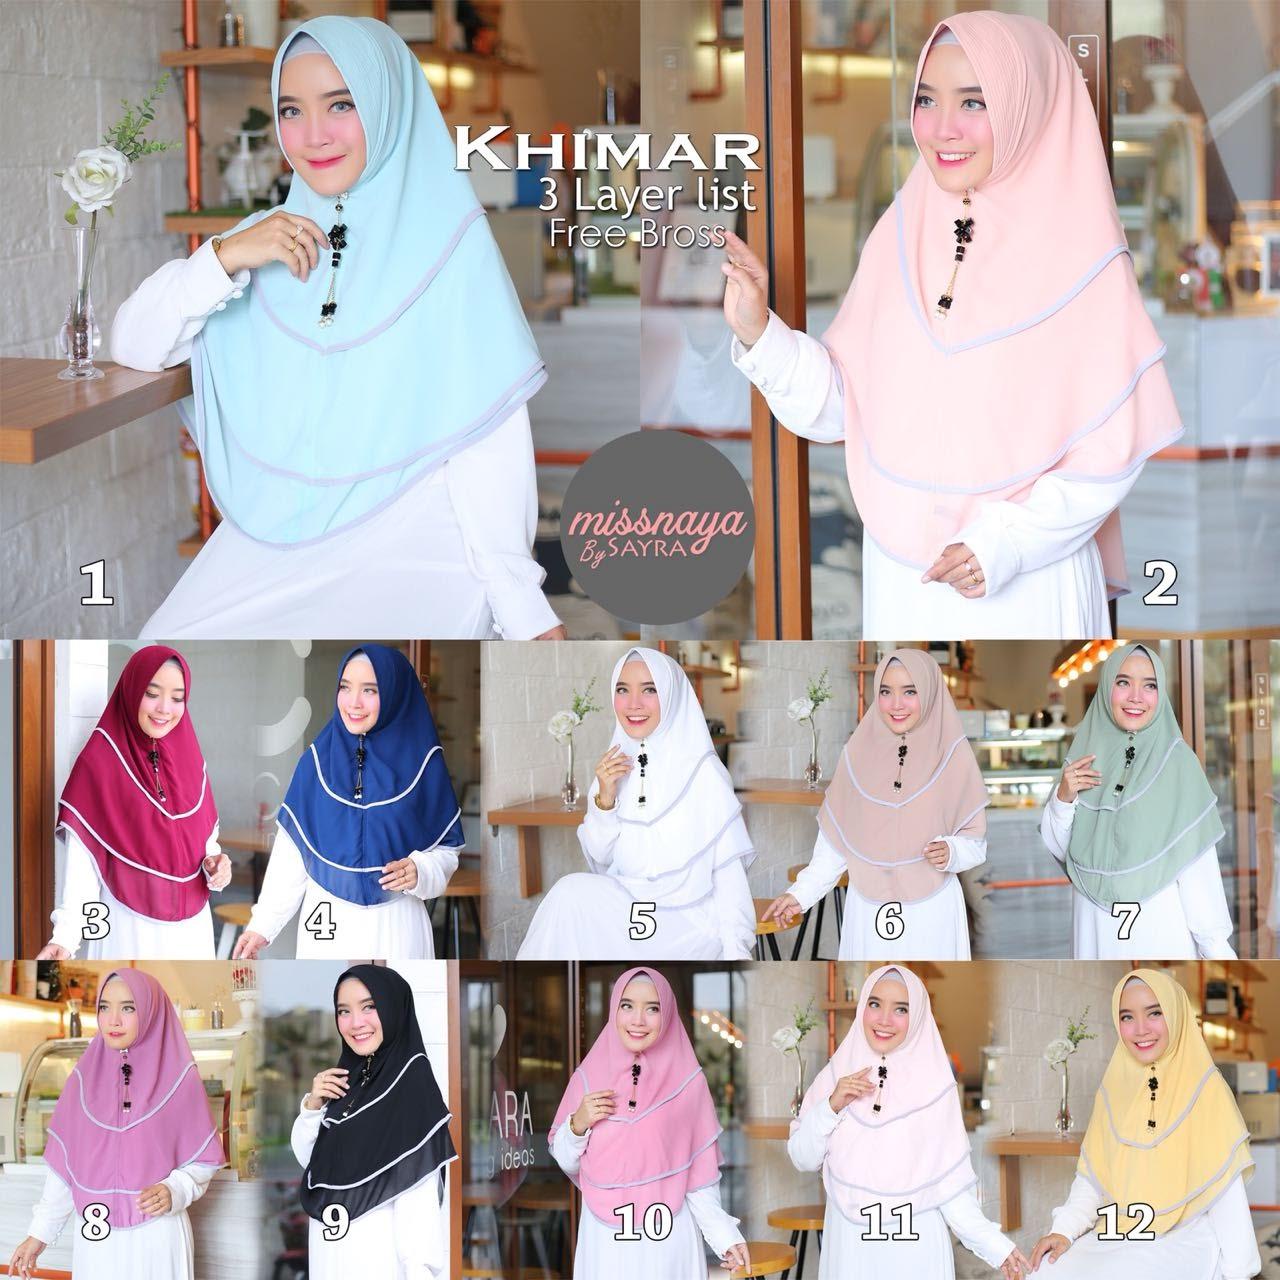 Khimar 3 Layer List Free Bross By Missnaya Melody Fashion Jilbab 3layer Syari Ori